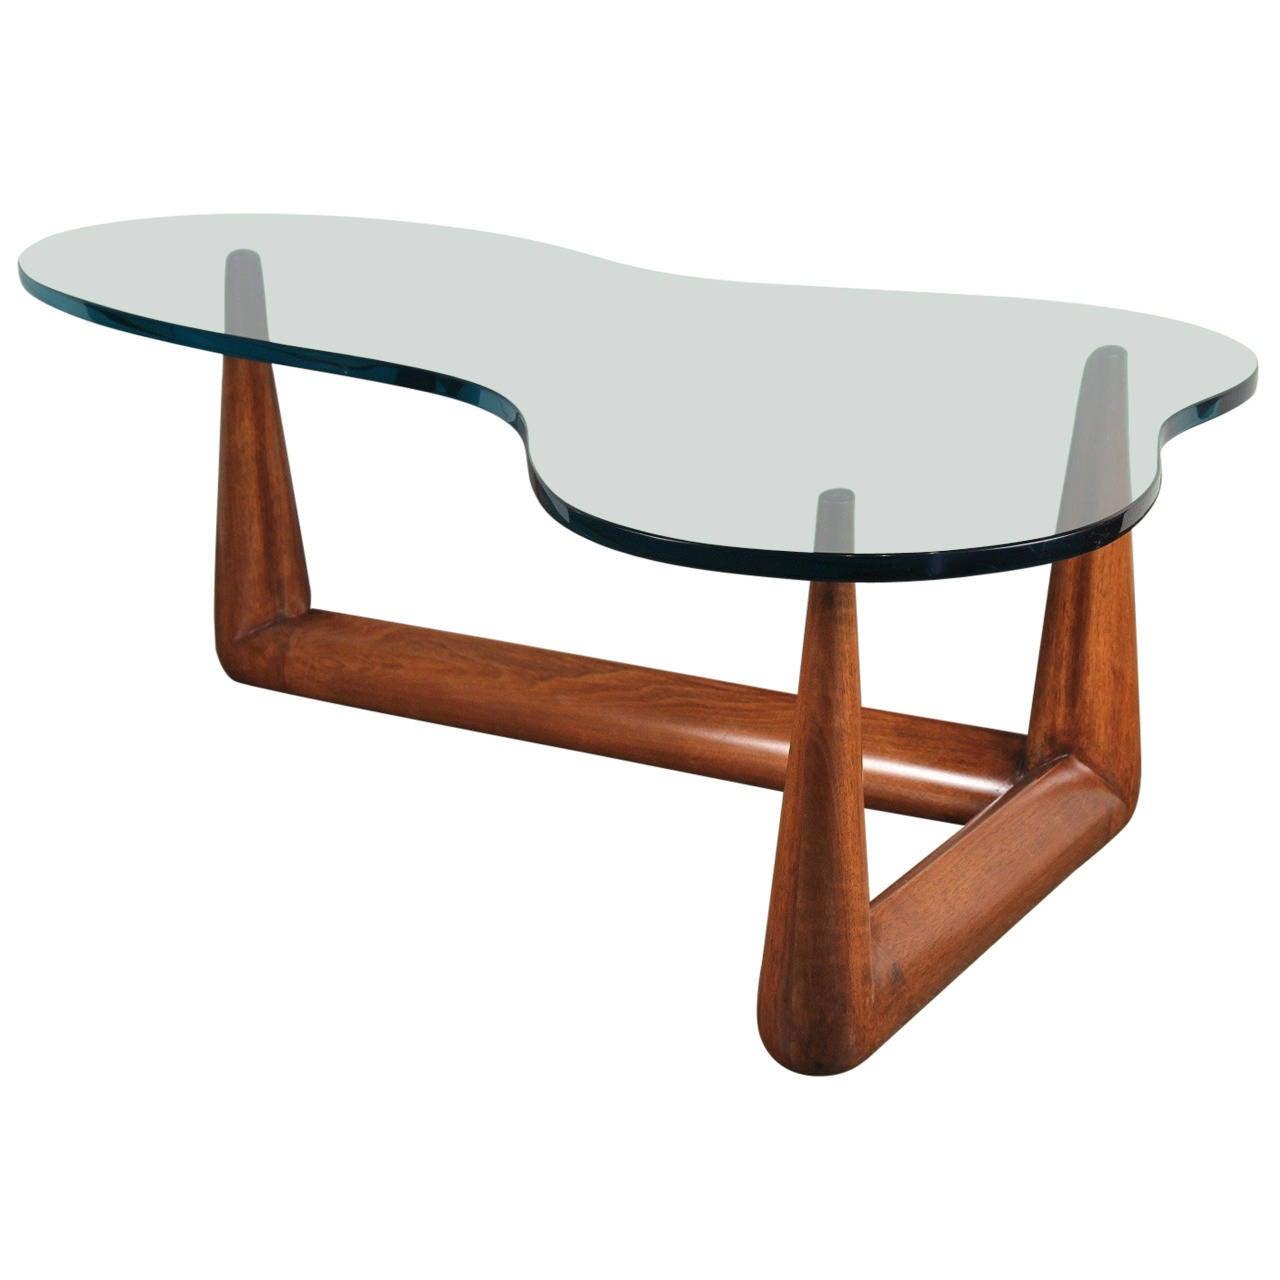 T. H. Robsjohn-Gibbings Biomorphic Glass Coffee Table